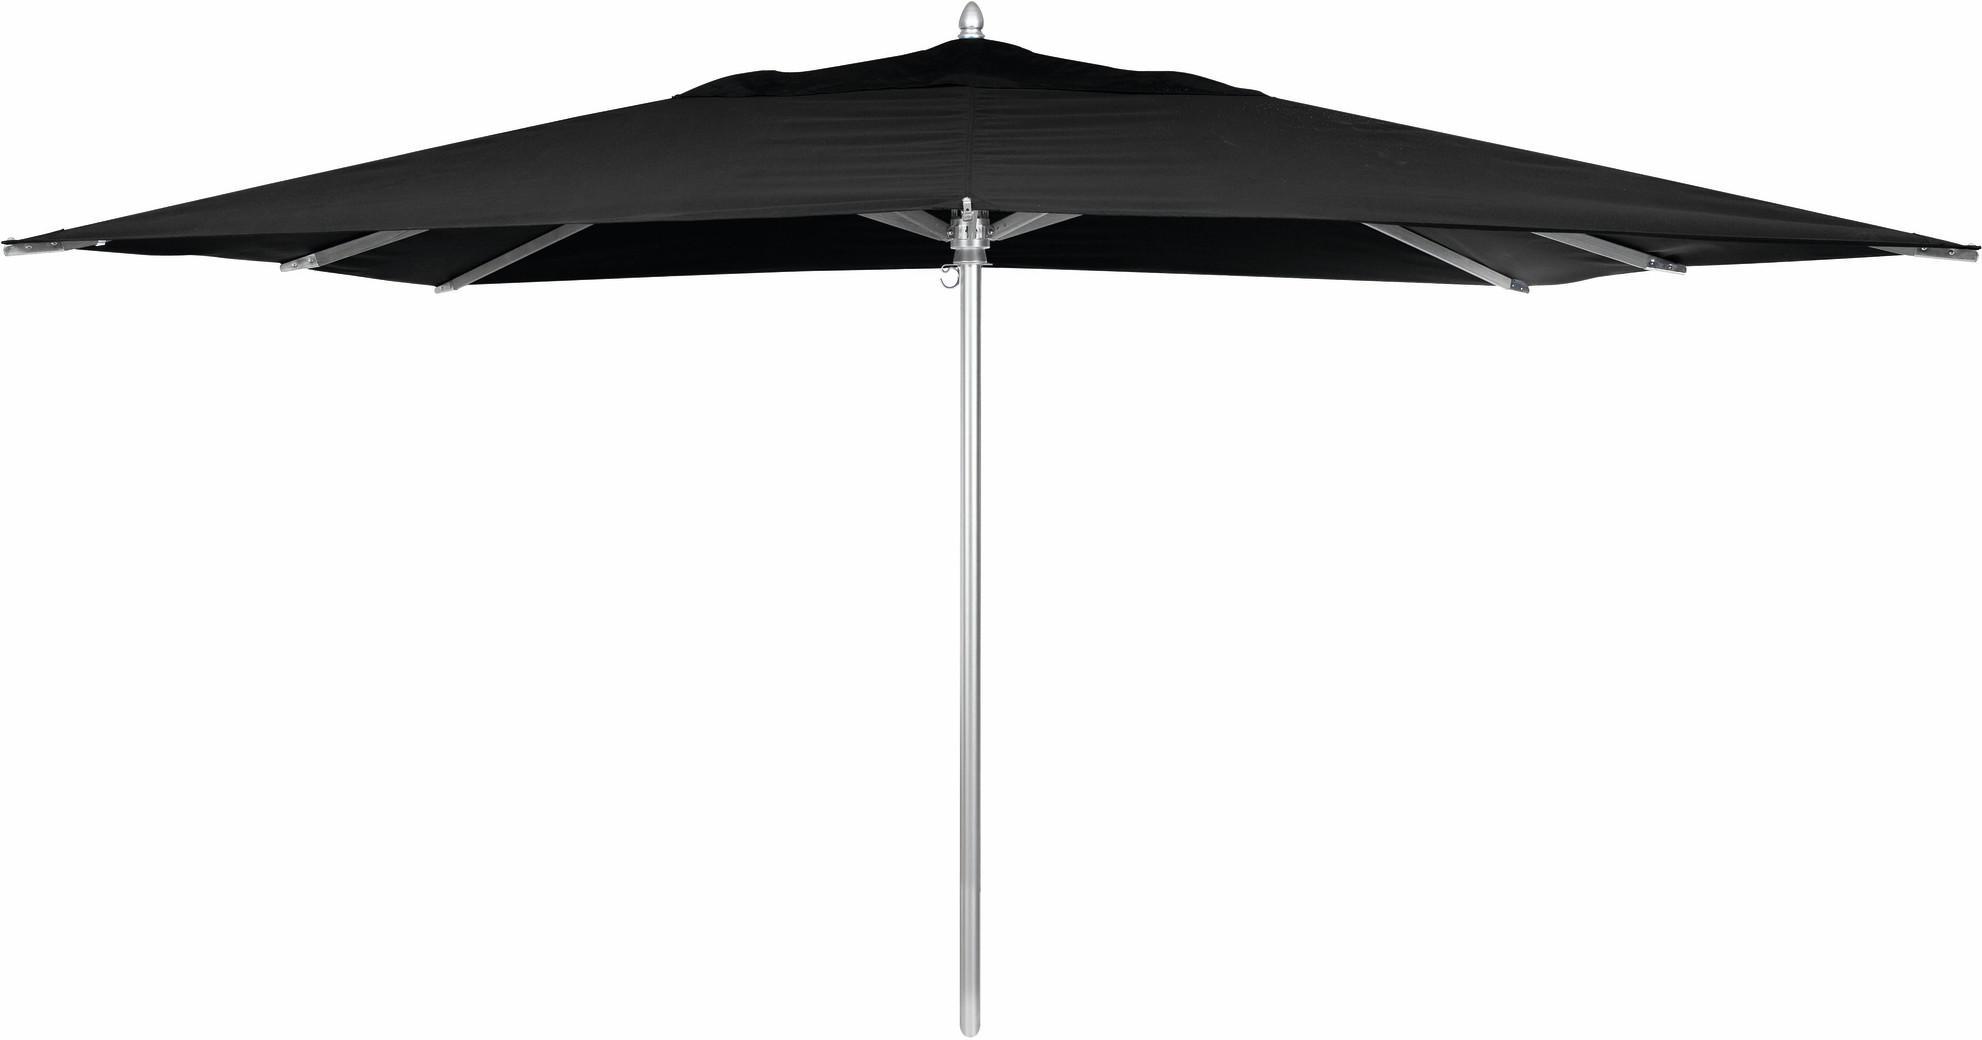 Sonnenschirm - Aluminium - 300x400 - schwarz